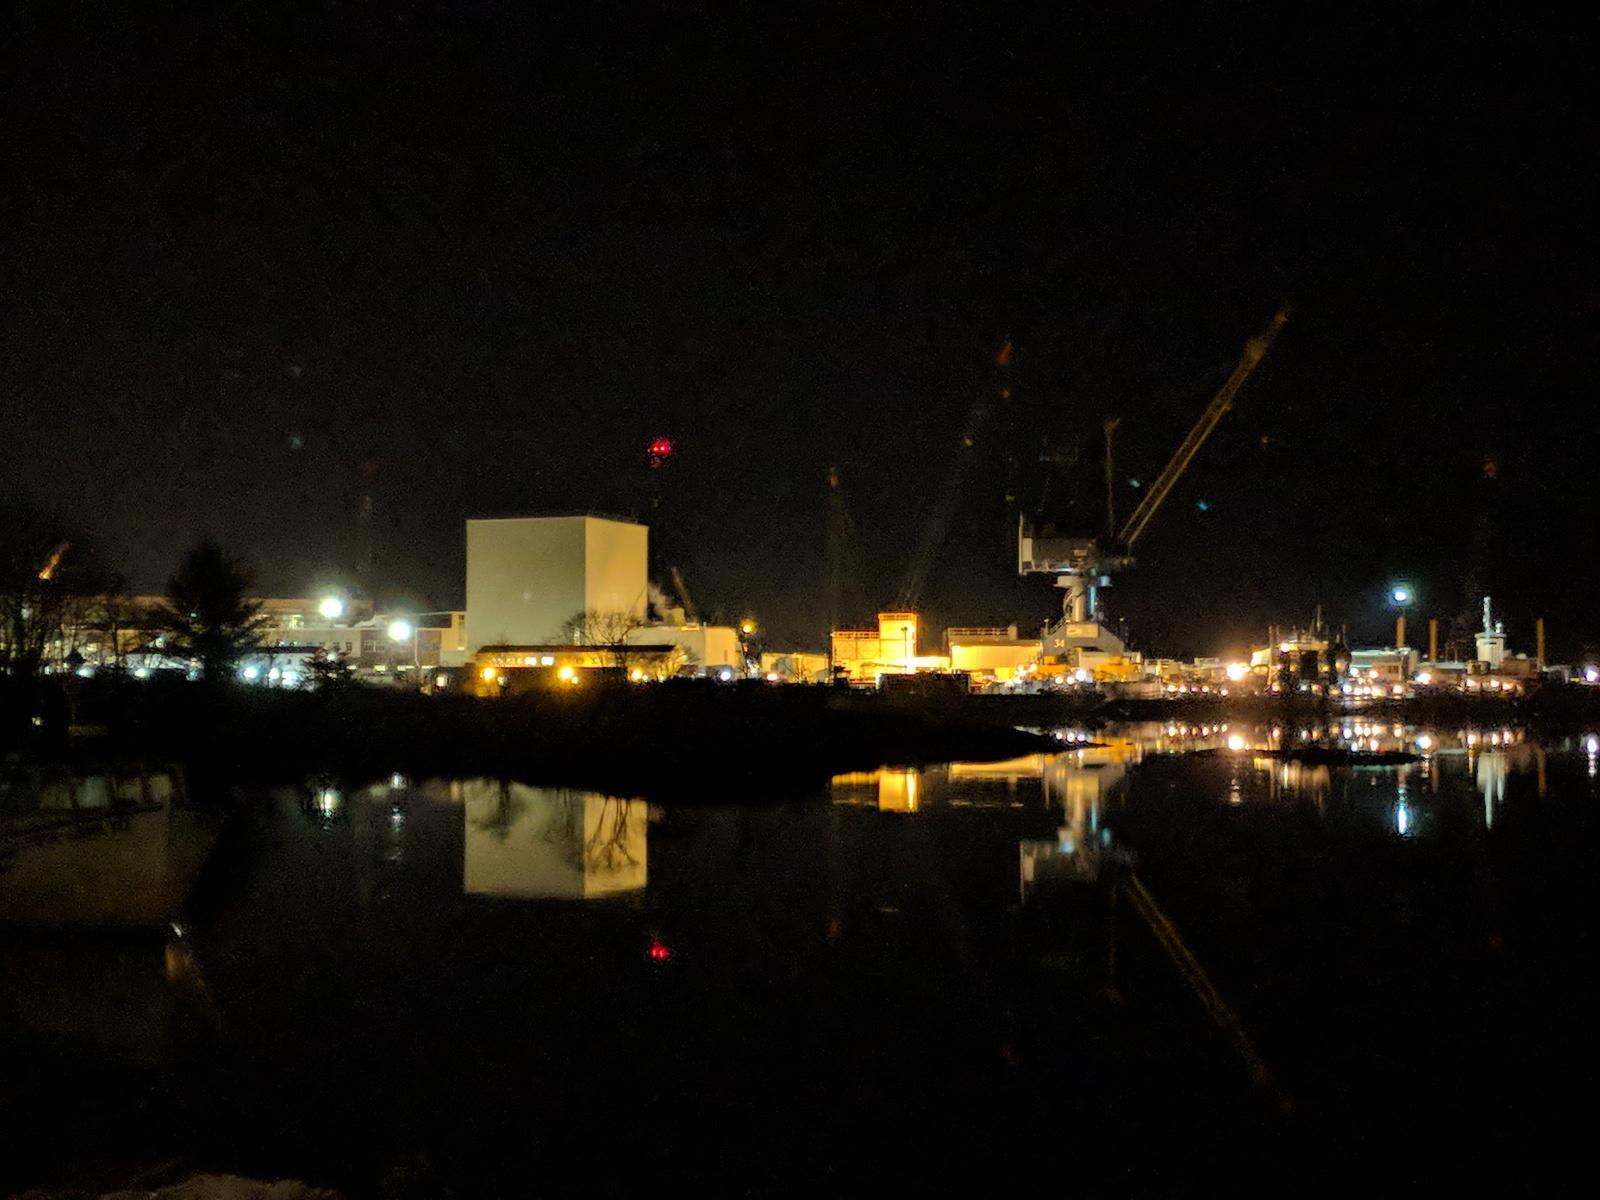 Portsmouth Naval Shipyard at night New Hampshire Anura Guruge Google Pixel 2